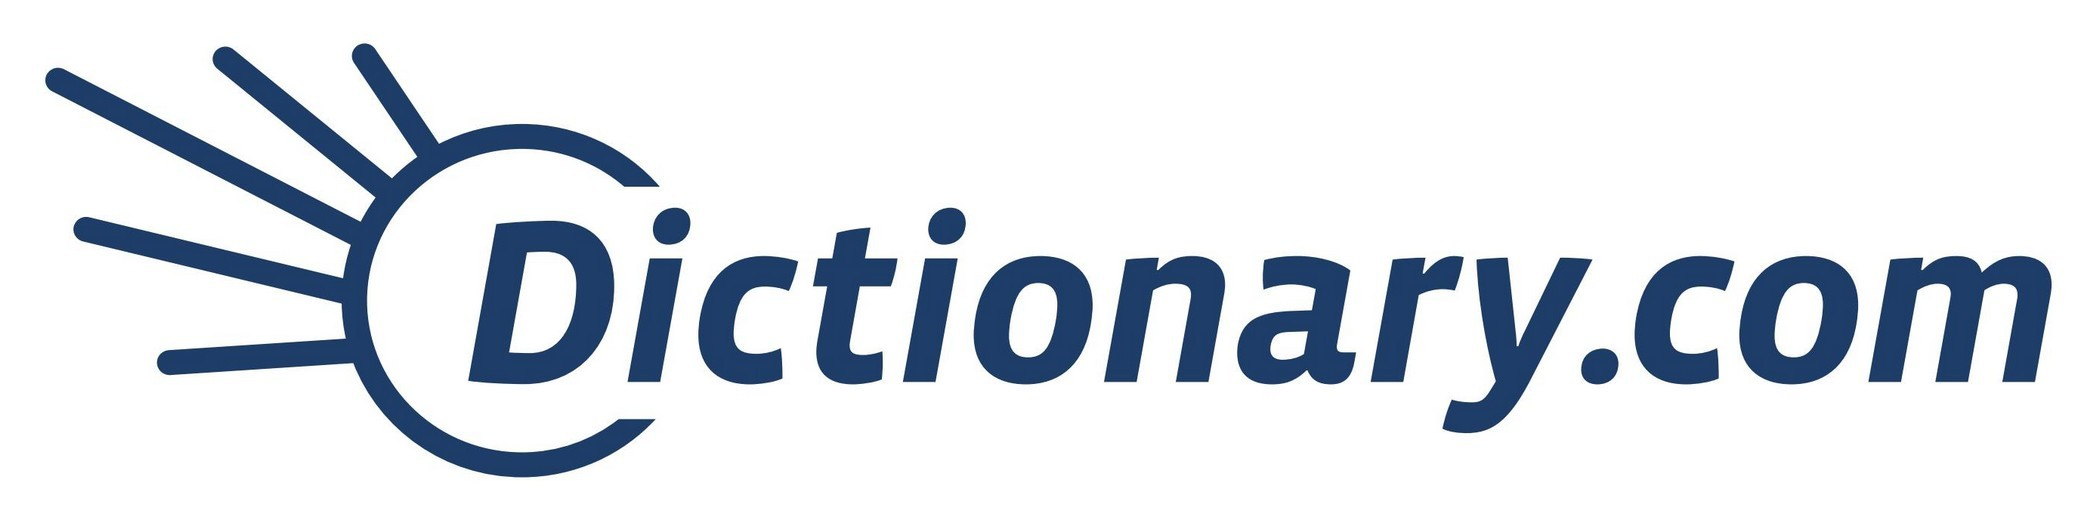 Dictionary.com Logo [EPS File] Vector EPS Free Download, Logo, Icons, Brand Emblems